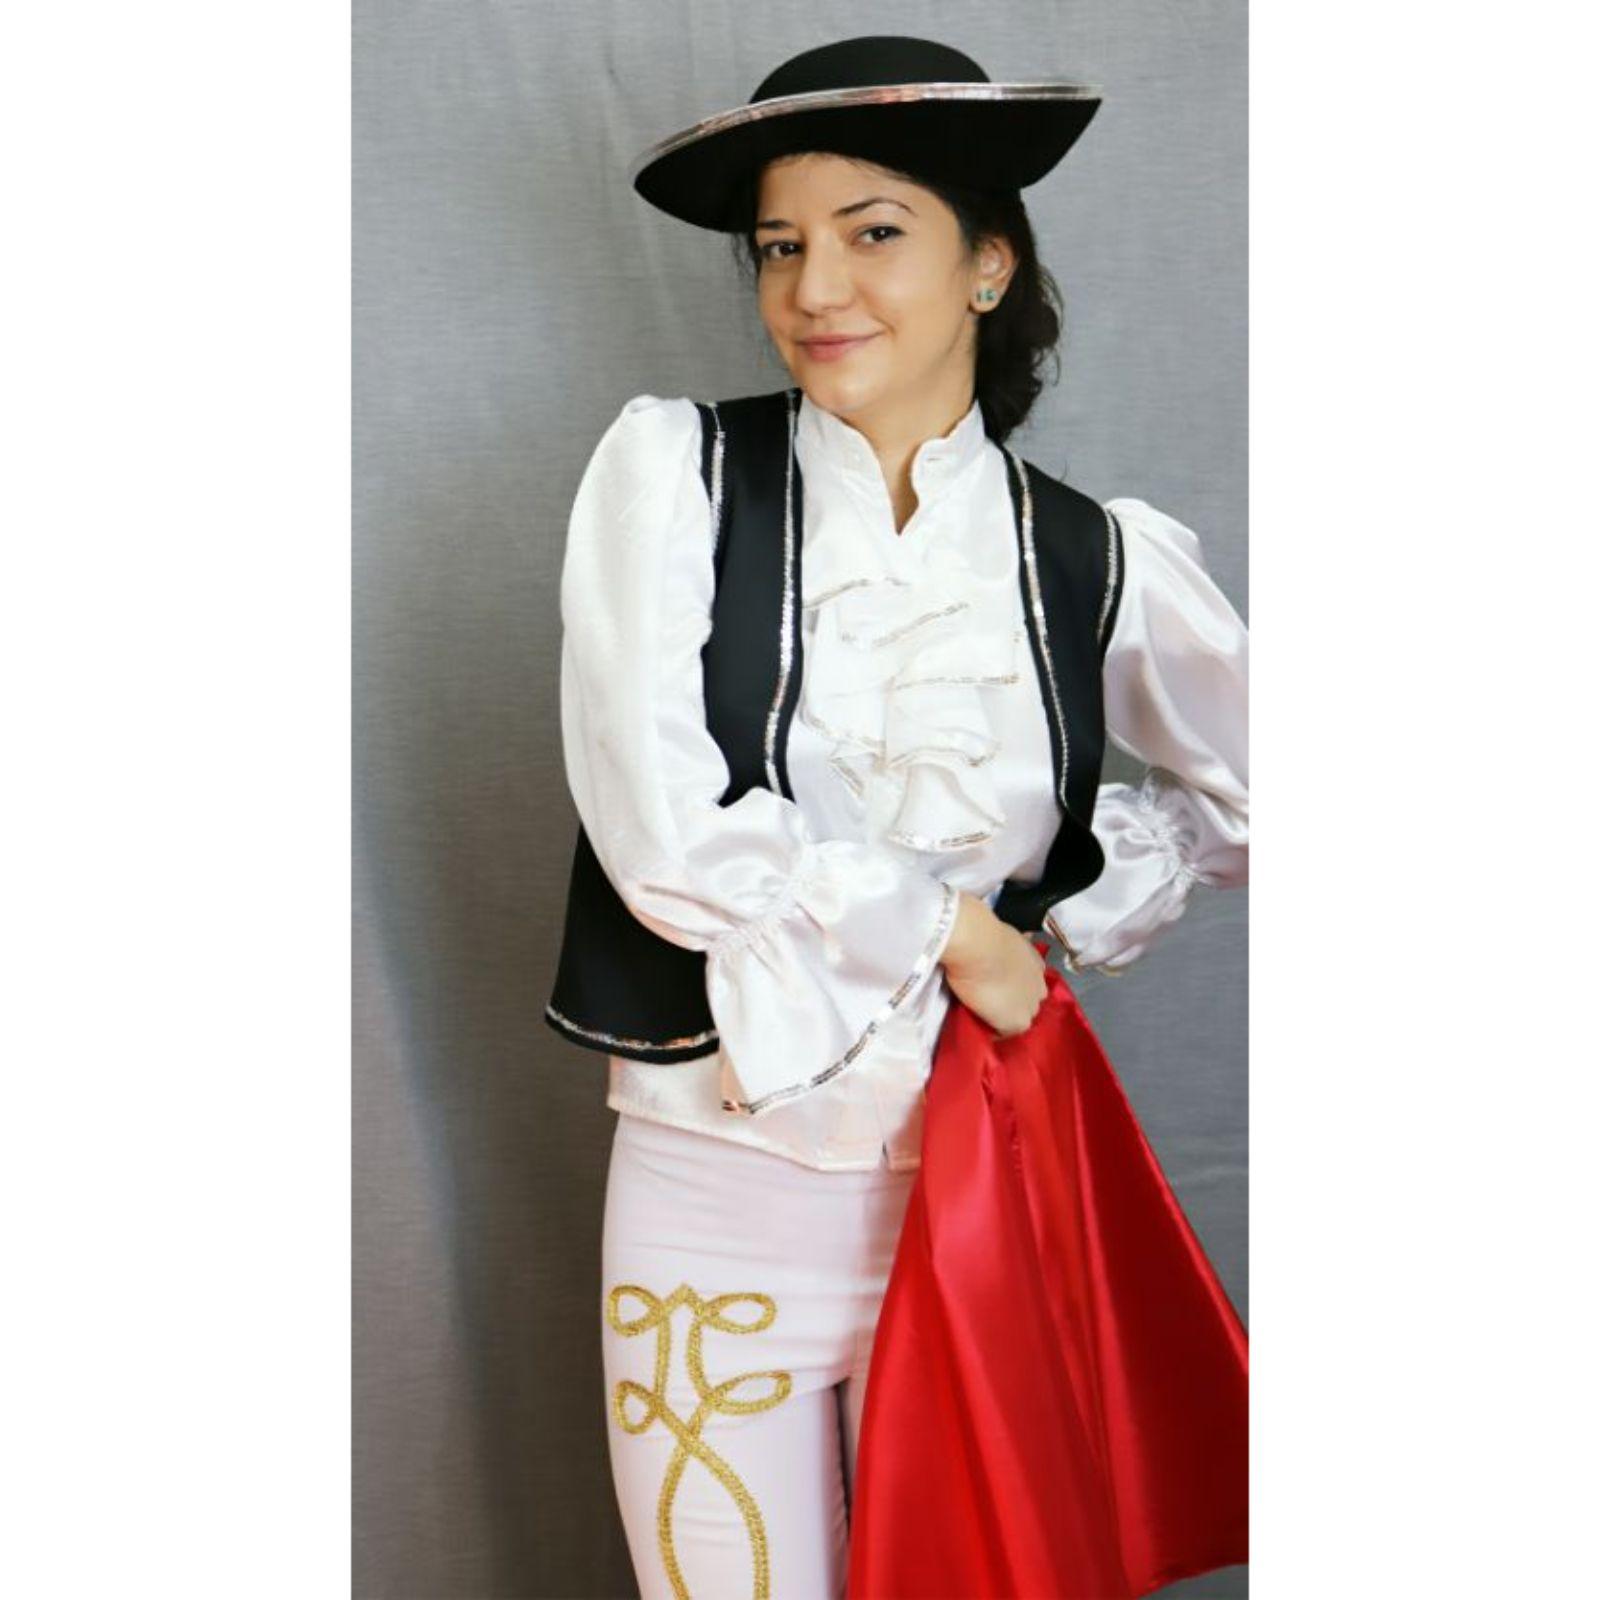 Costum matador / toreador copii